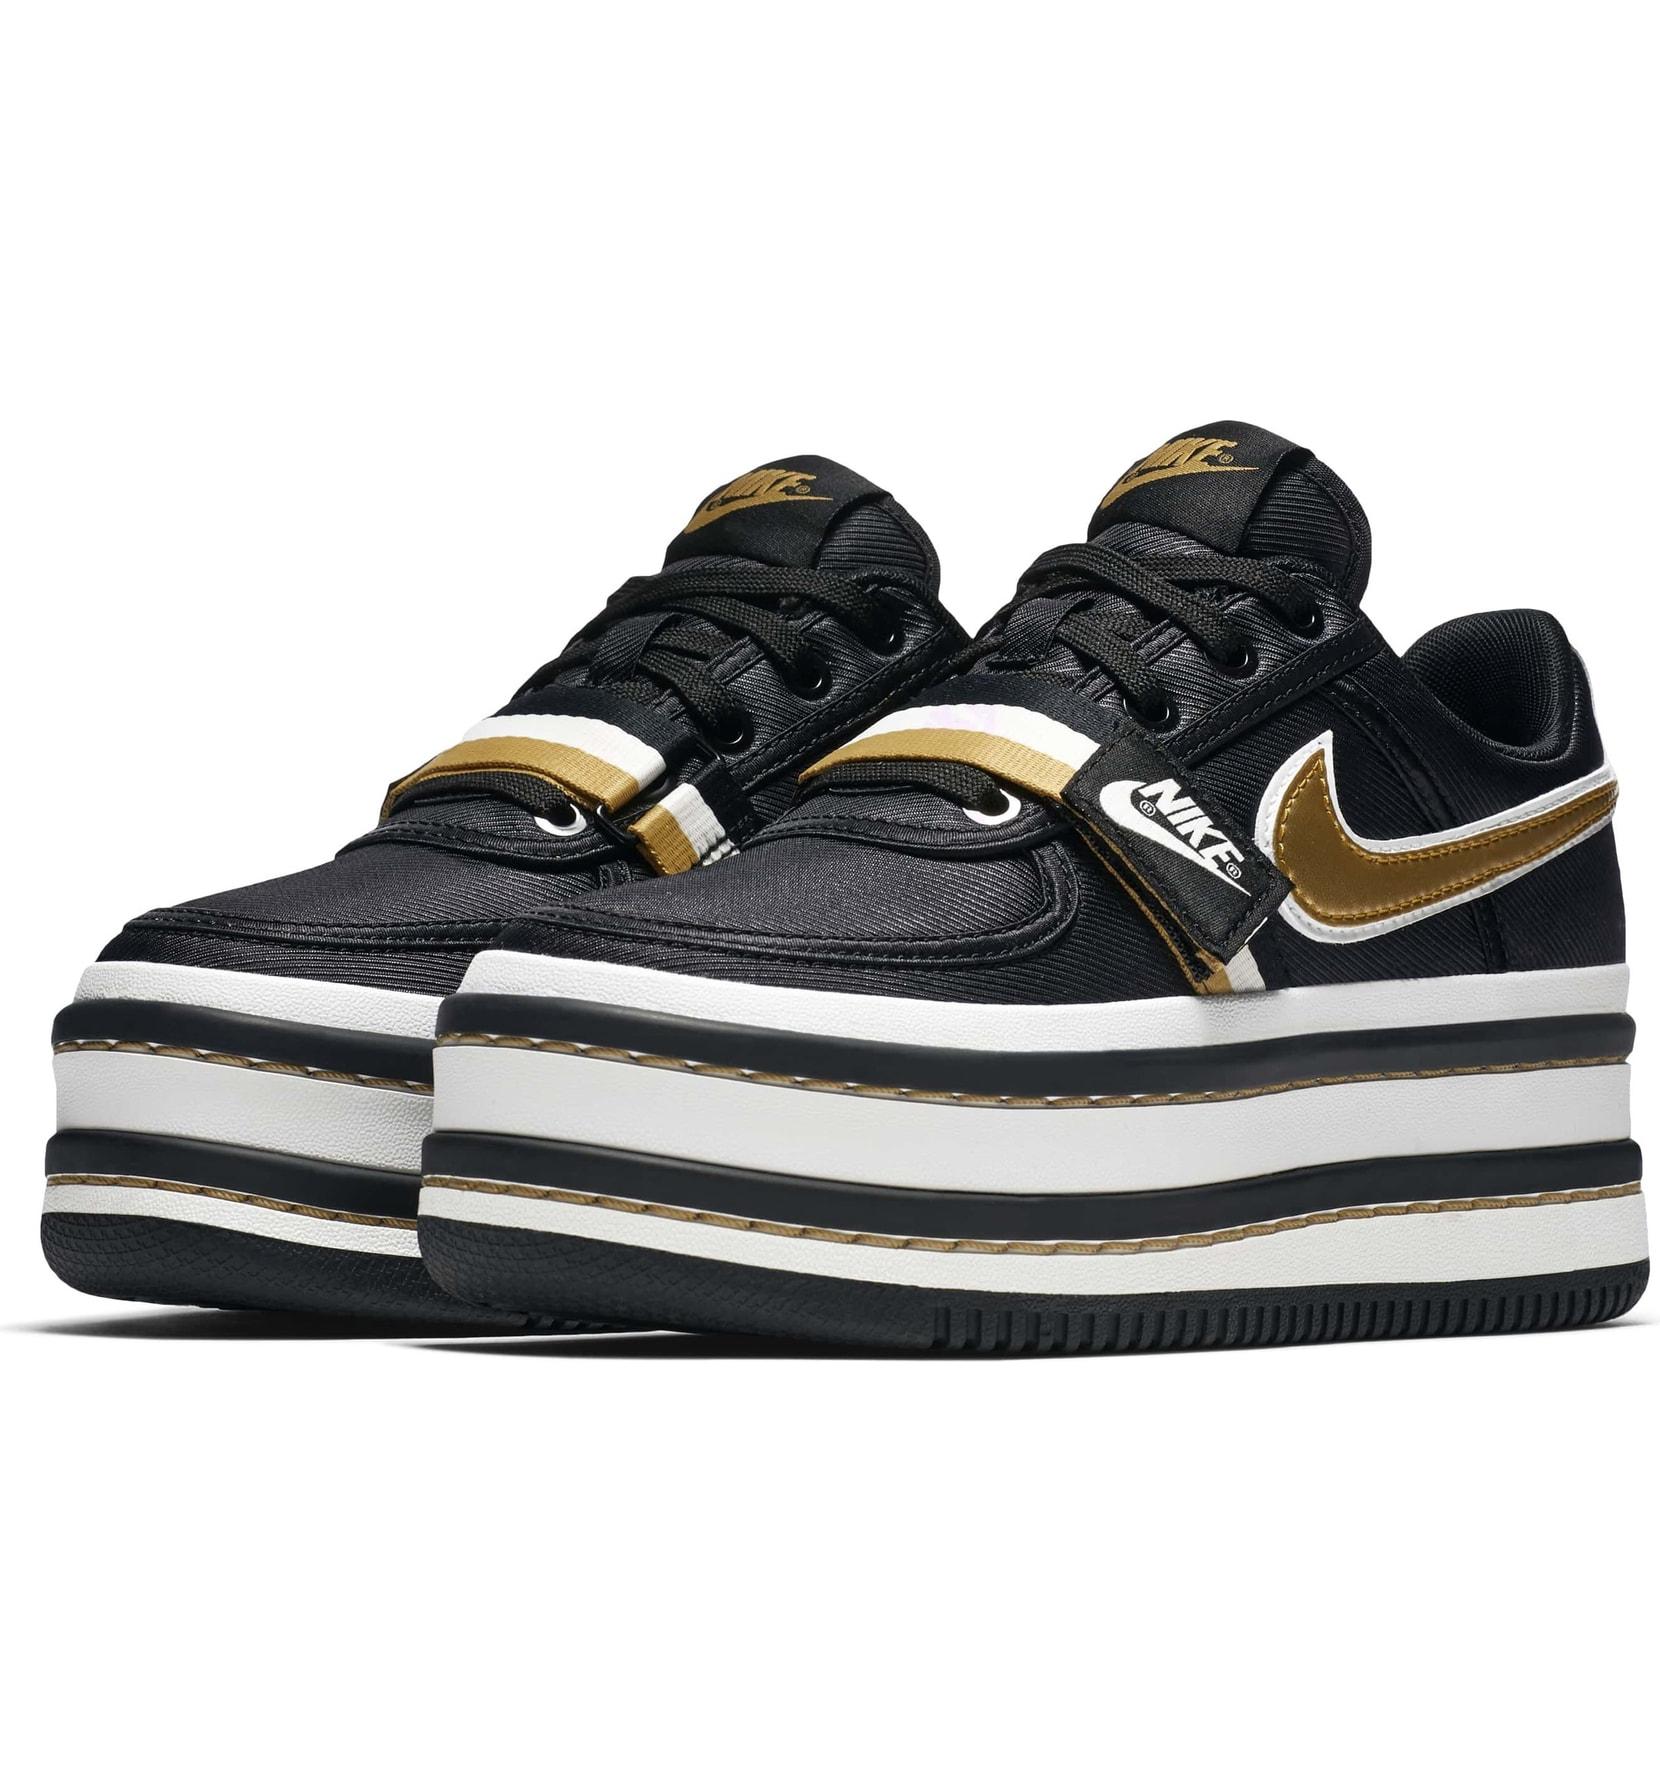 reputable site 02ea9 3632d NIKE Vandal 2K Sneaker - ShopPulp